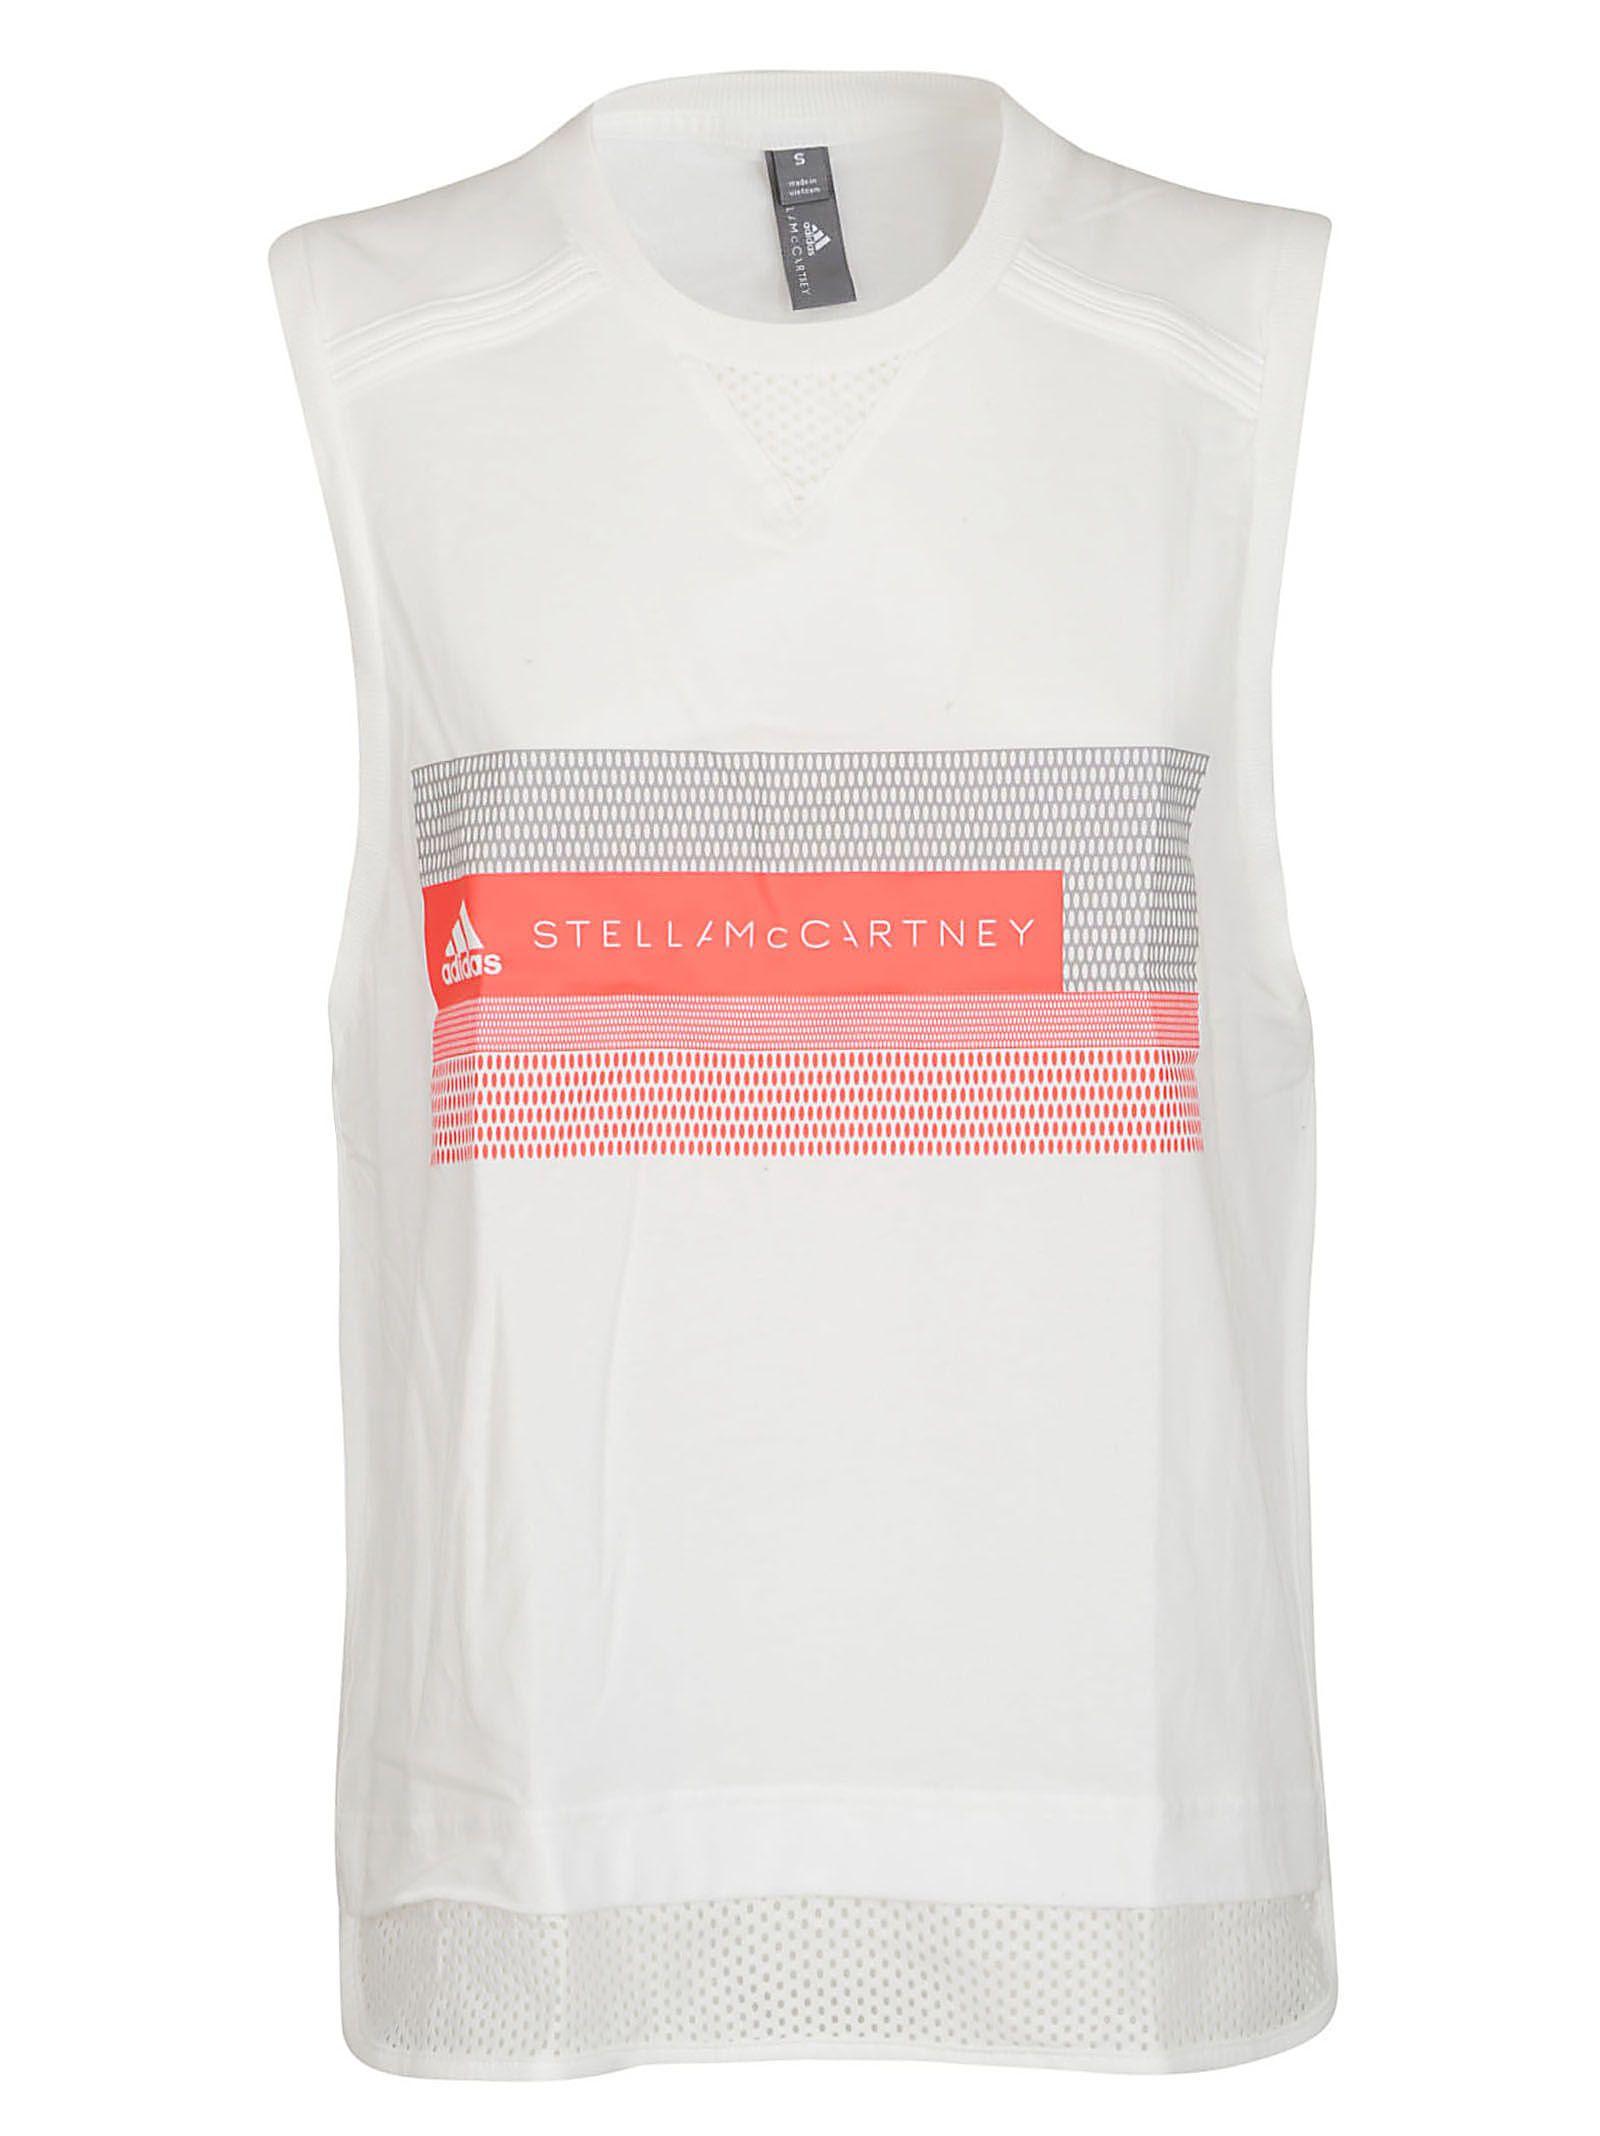 get cheap ad6aa b6e15 Adidas by Stella McCartney Mesh Panel Tank Top - White ...